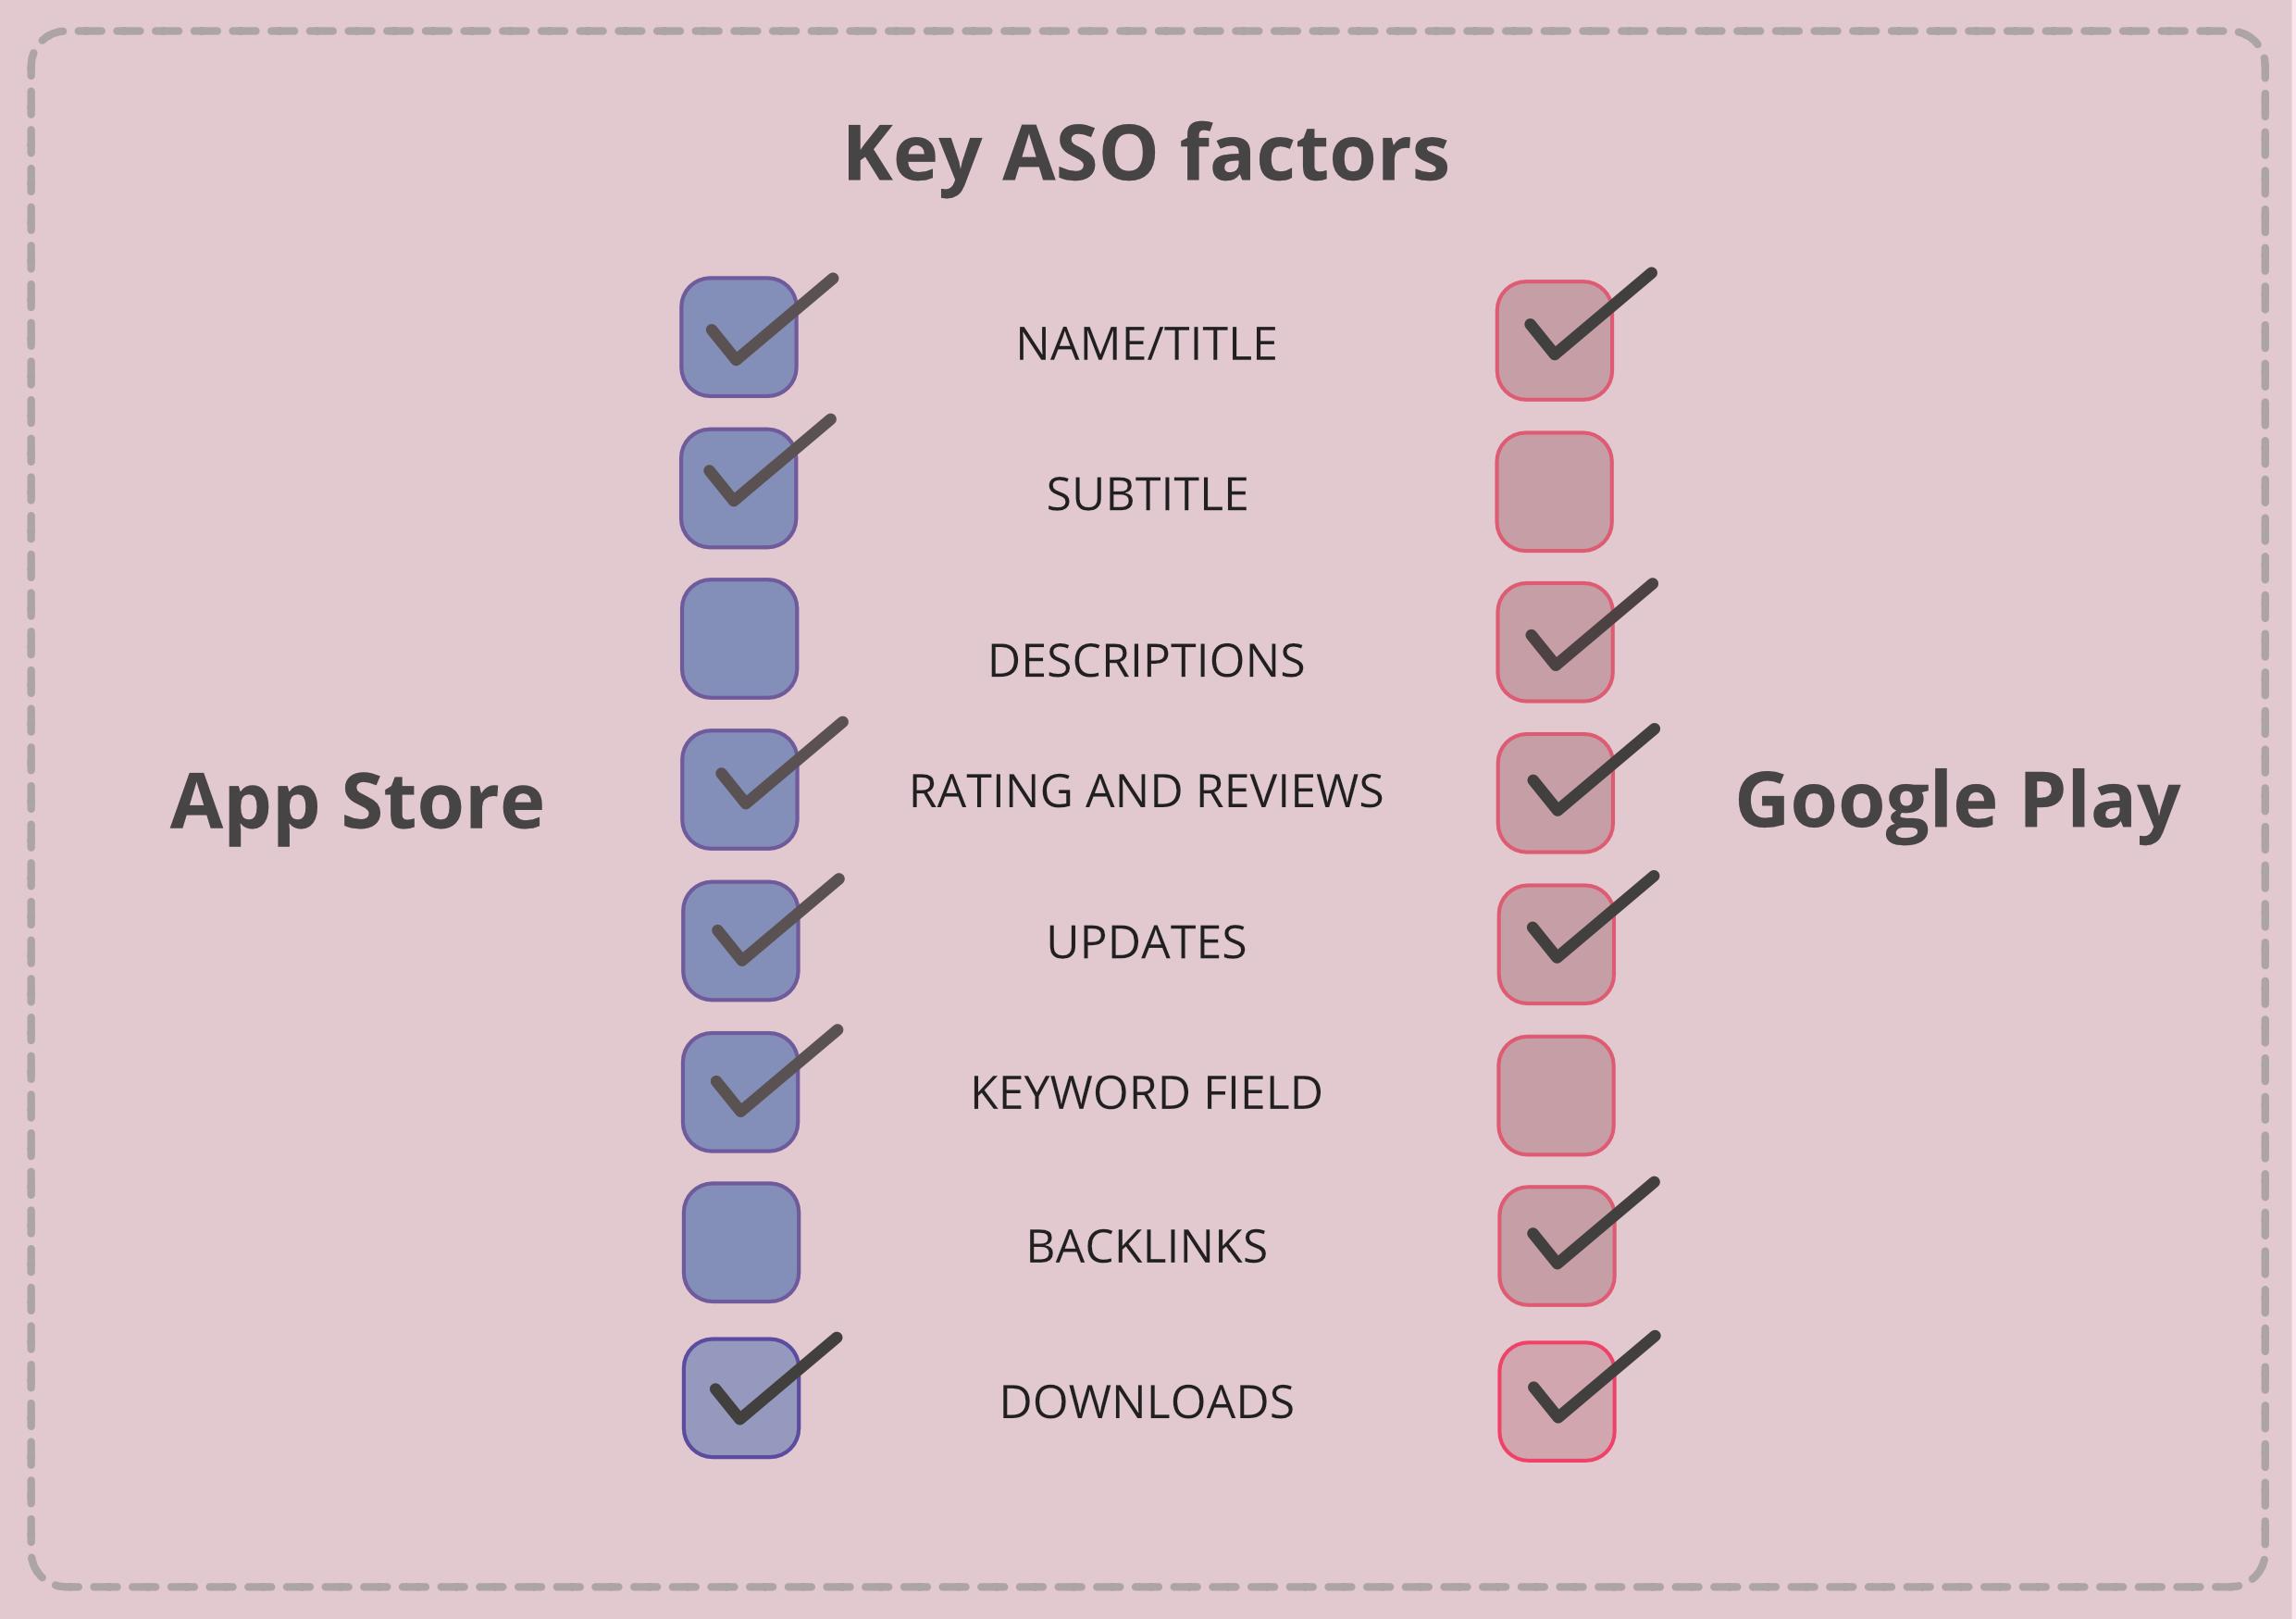 Basic ASO factors